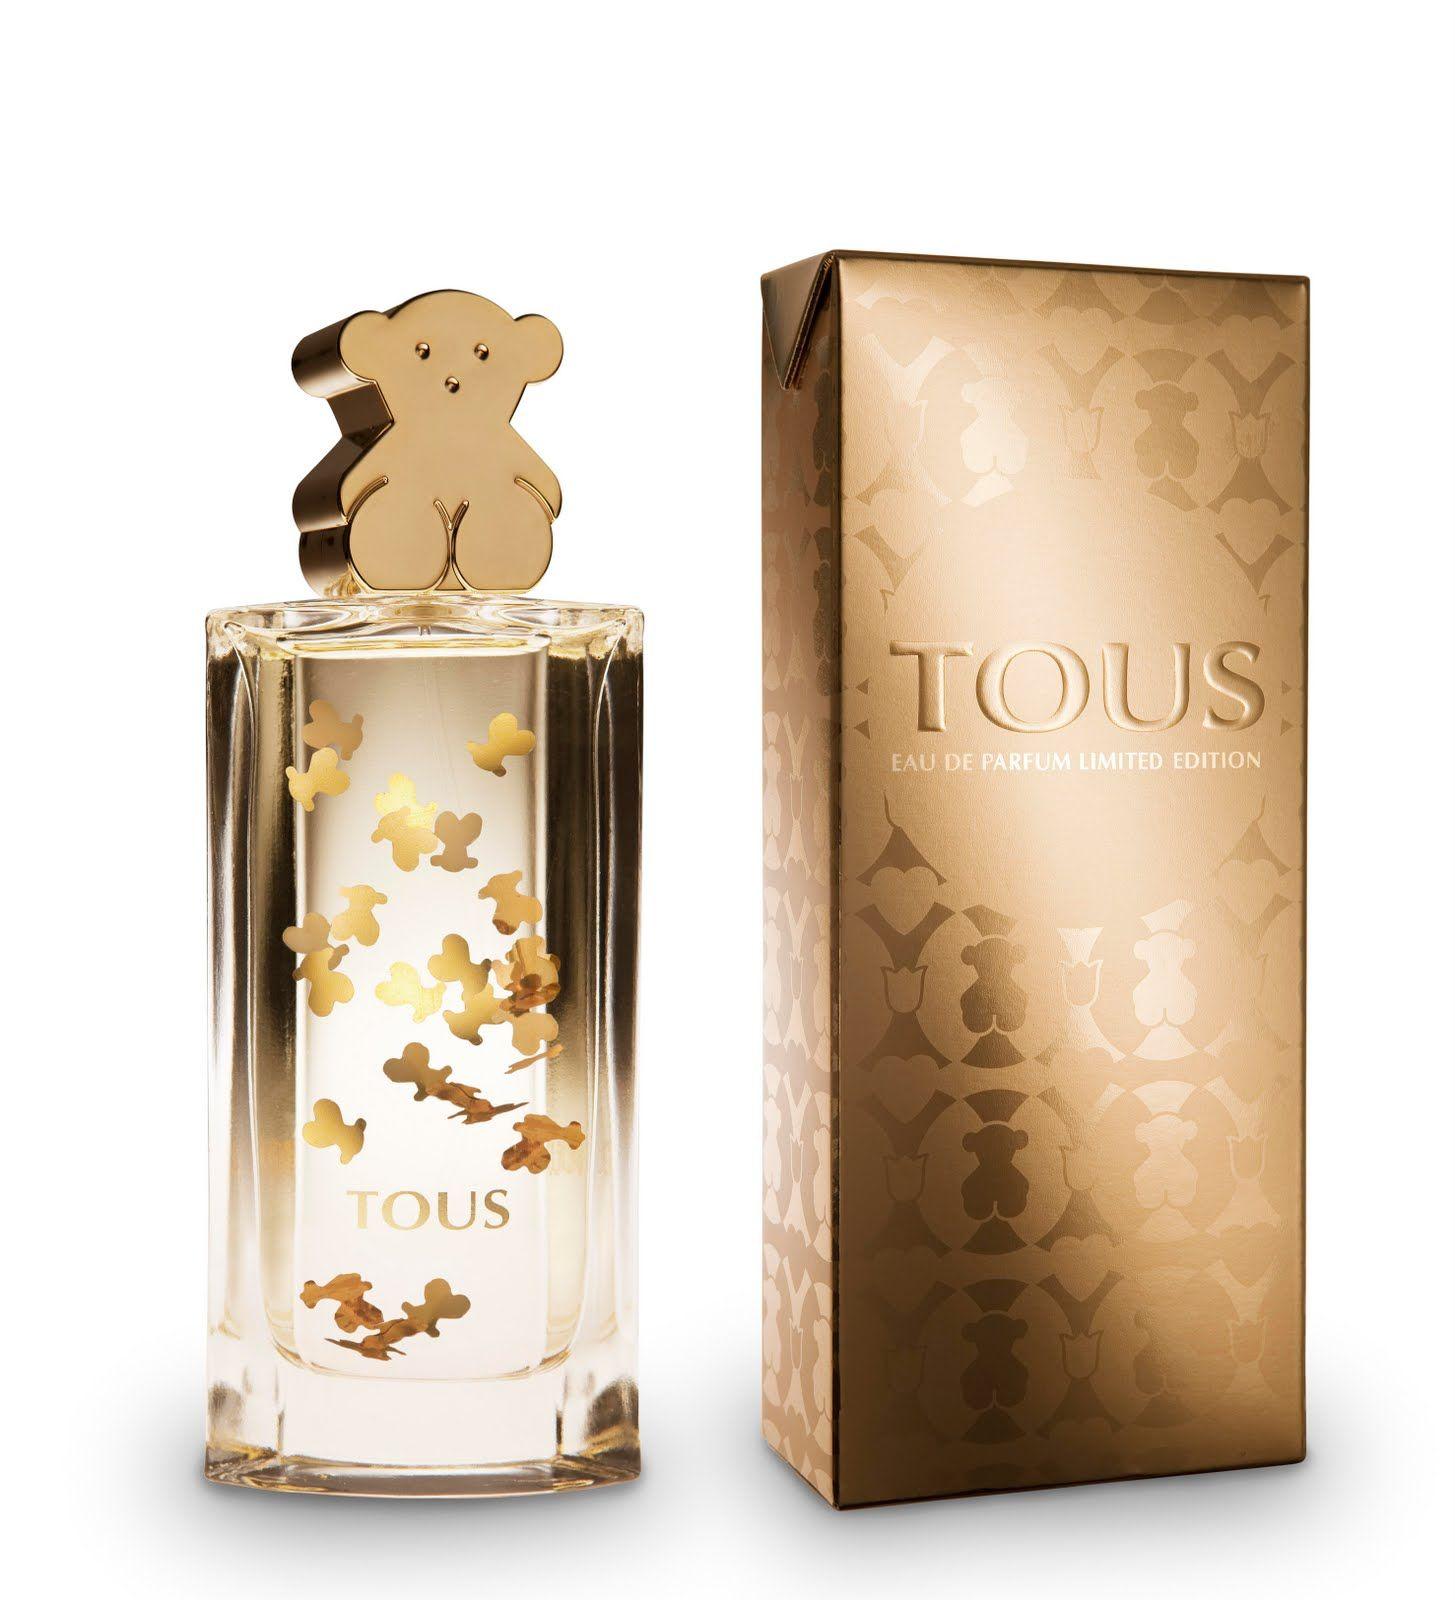 perfume | Perfumes tous, Perfume de mujer, Botella de perfume